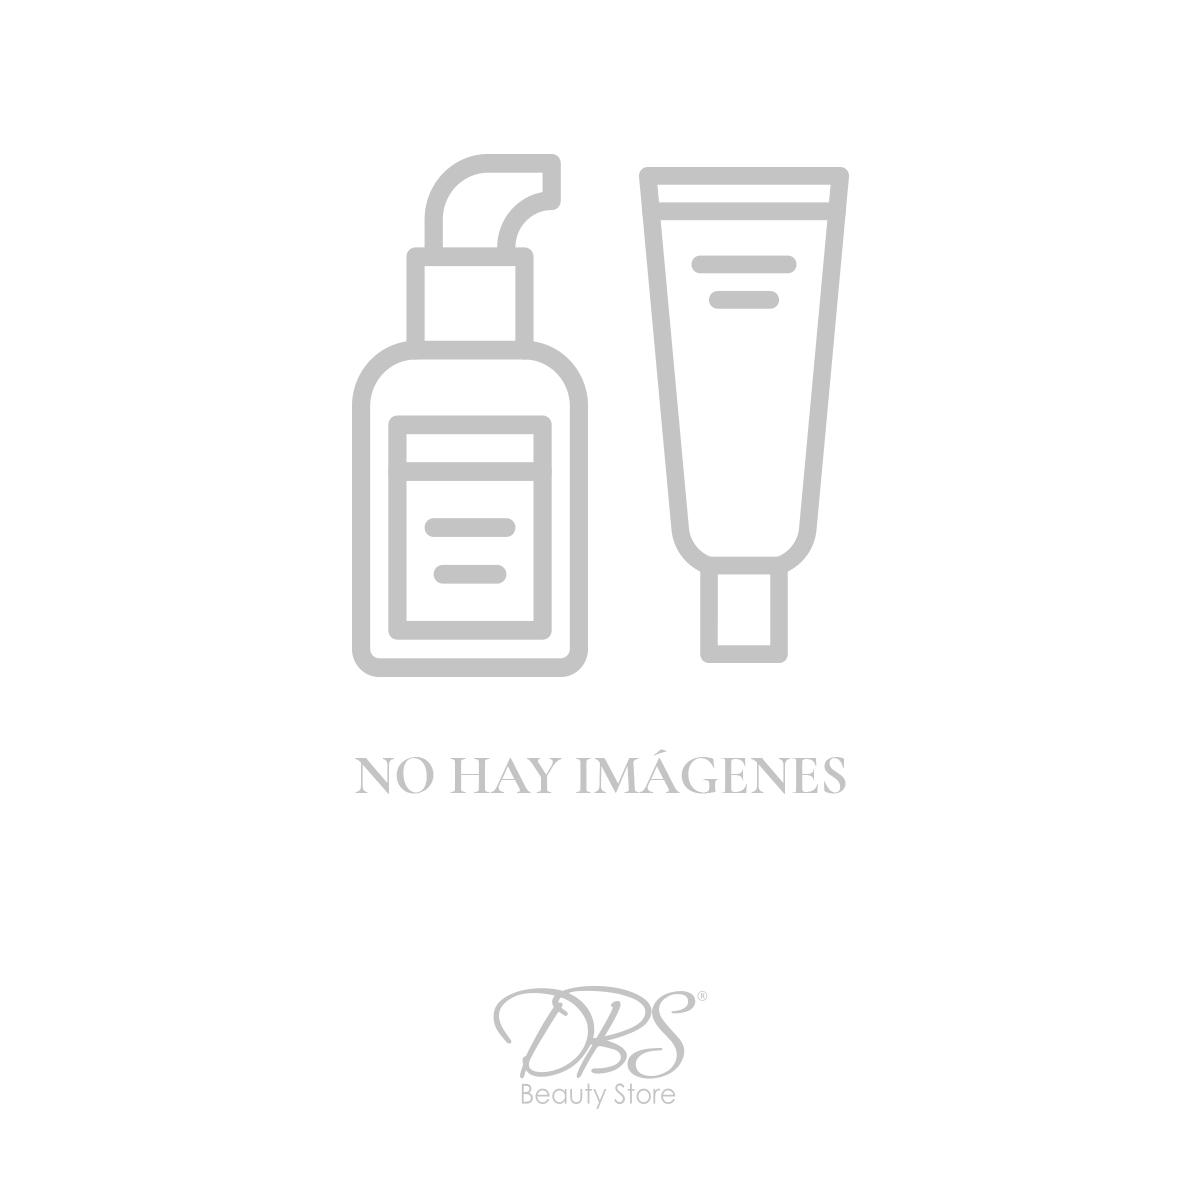 body-luxuries-BL-LB002-MP.jpg